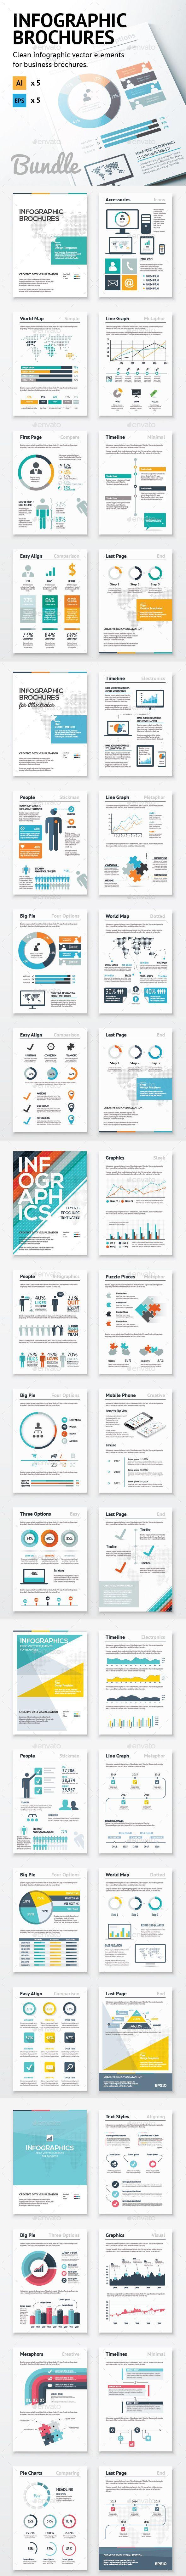 Infographic Brochure Elements Bundle Template #design Download: http://graphicriver.net/item/infographic-brochure-elements-bundle/10543927?ref=ksioks